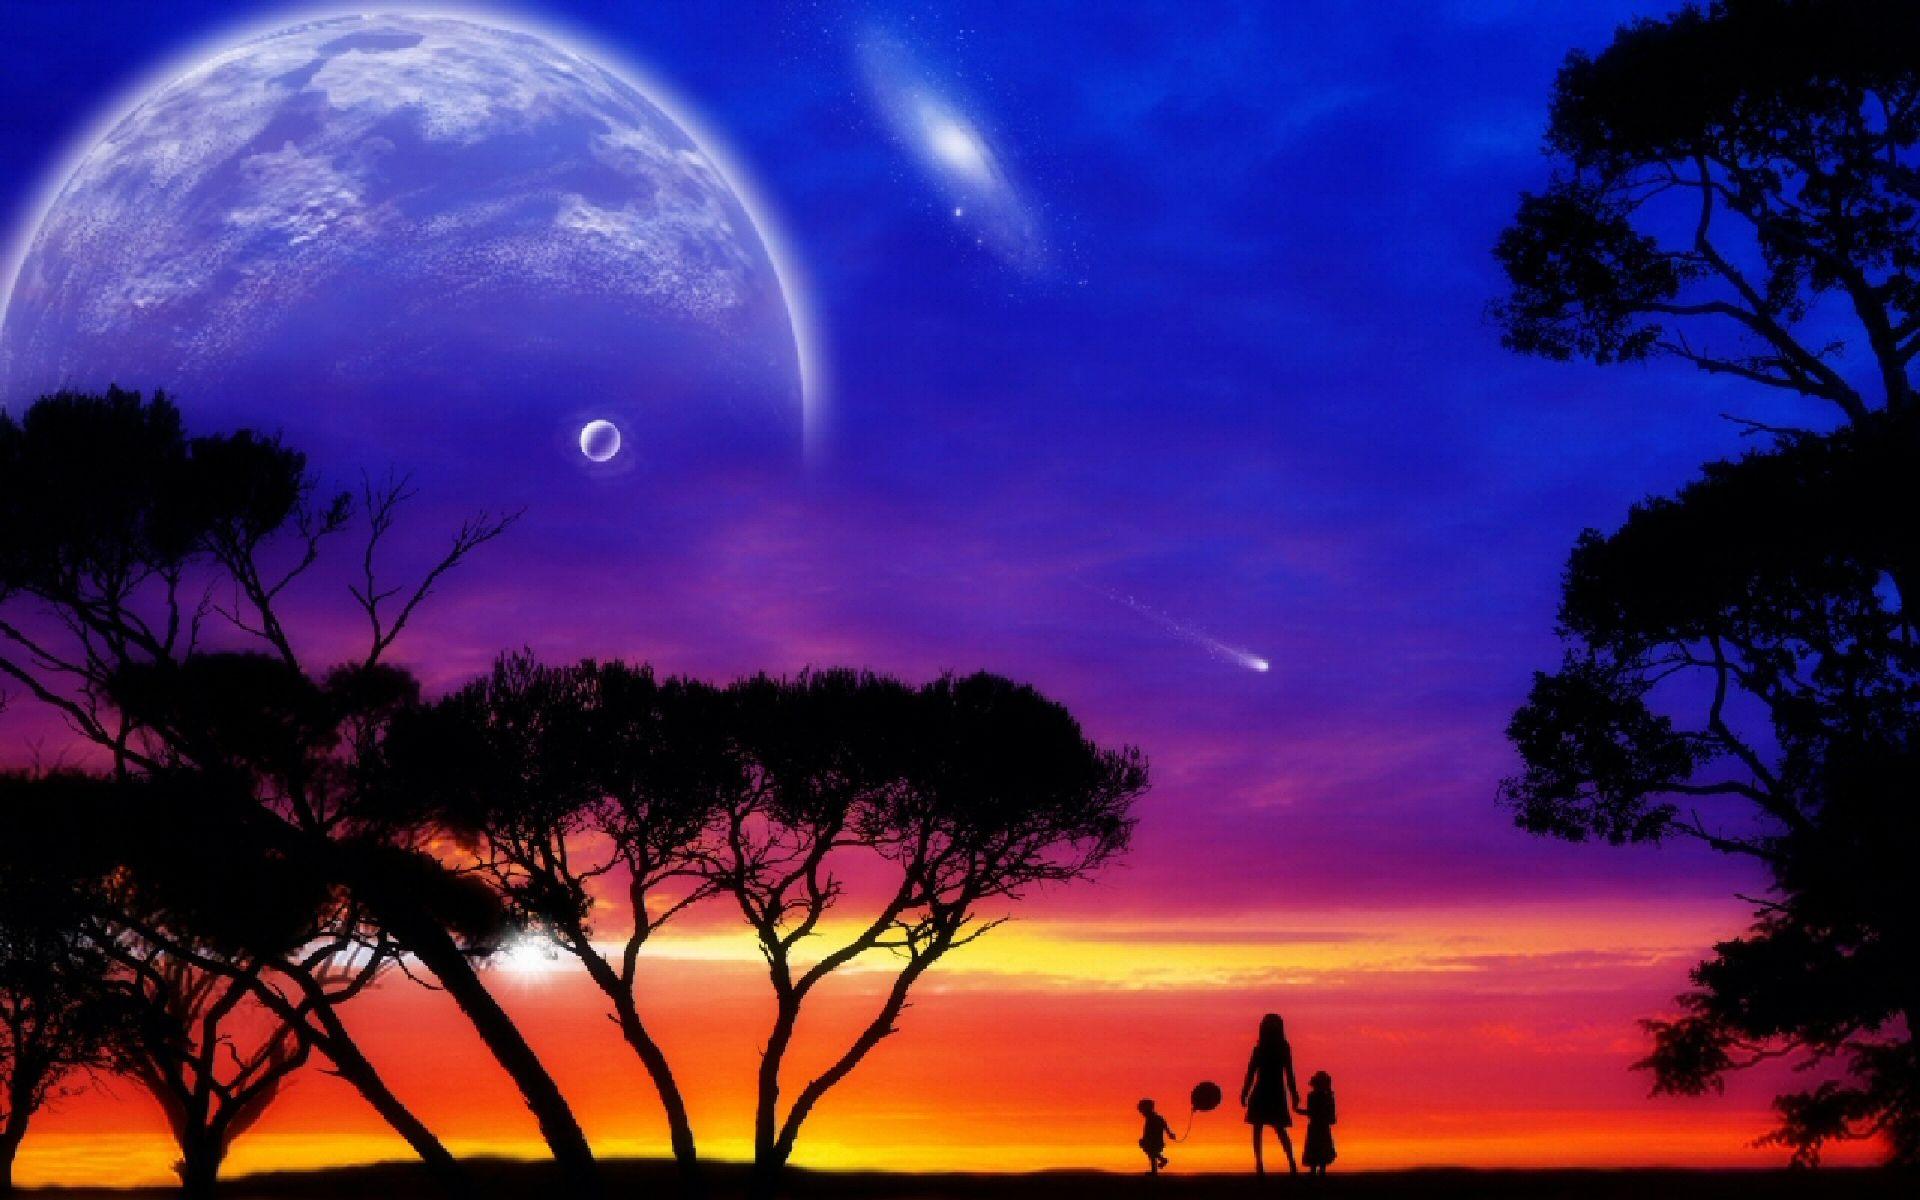 Fond Ecran Paysage Nature | Wonders avec Fond D'Ecran Hd Themes Elie S Book